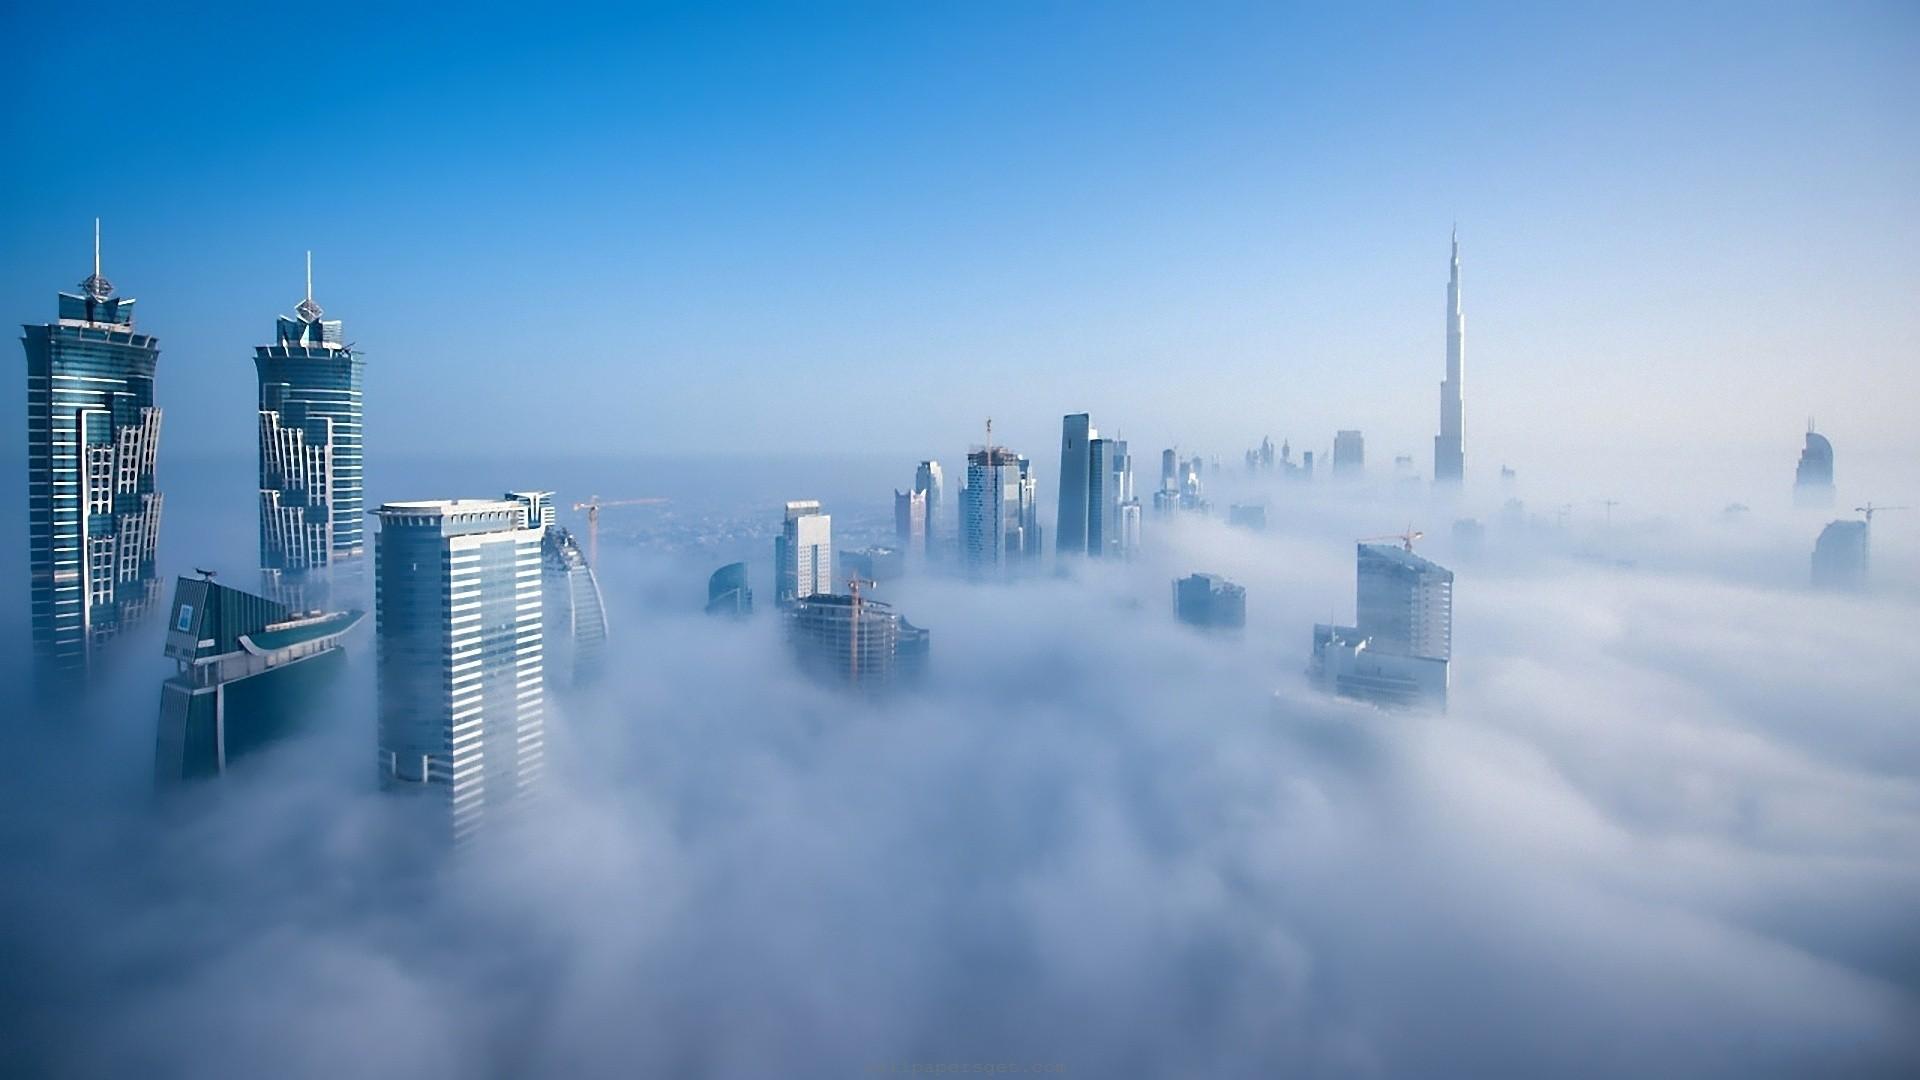 Fantastic city in the fog 52